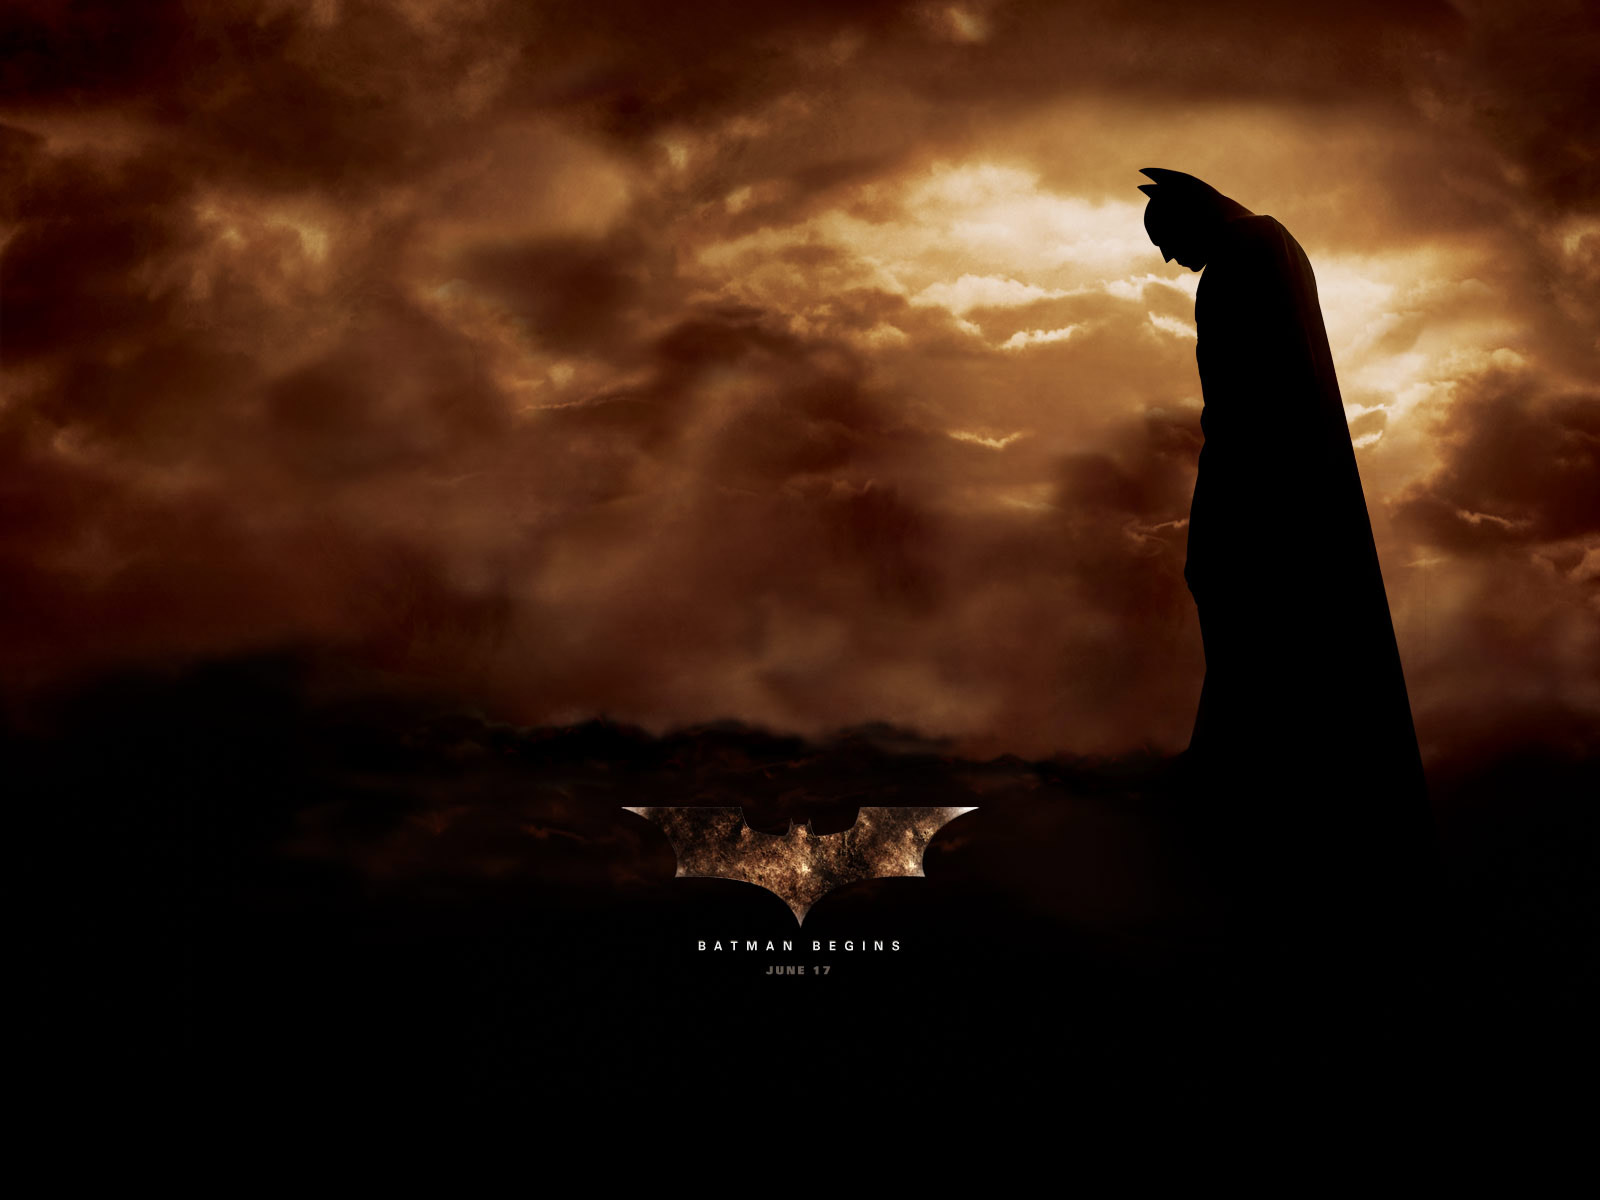 Batman Wallpaper Why Do We Fall Imagini Cu Batman Stolenimg